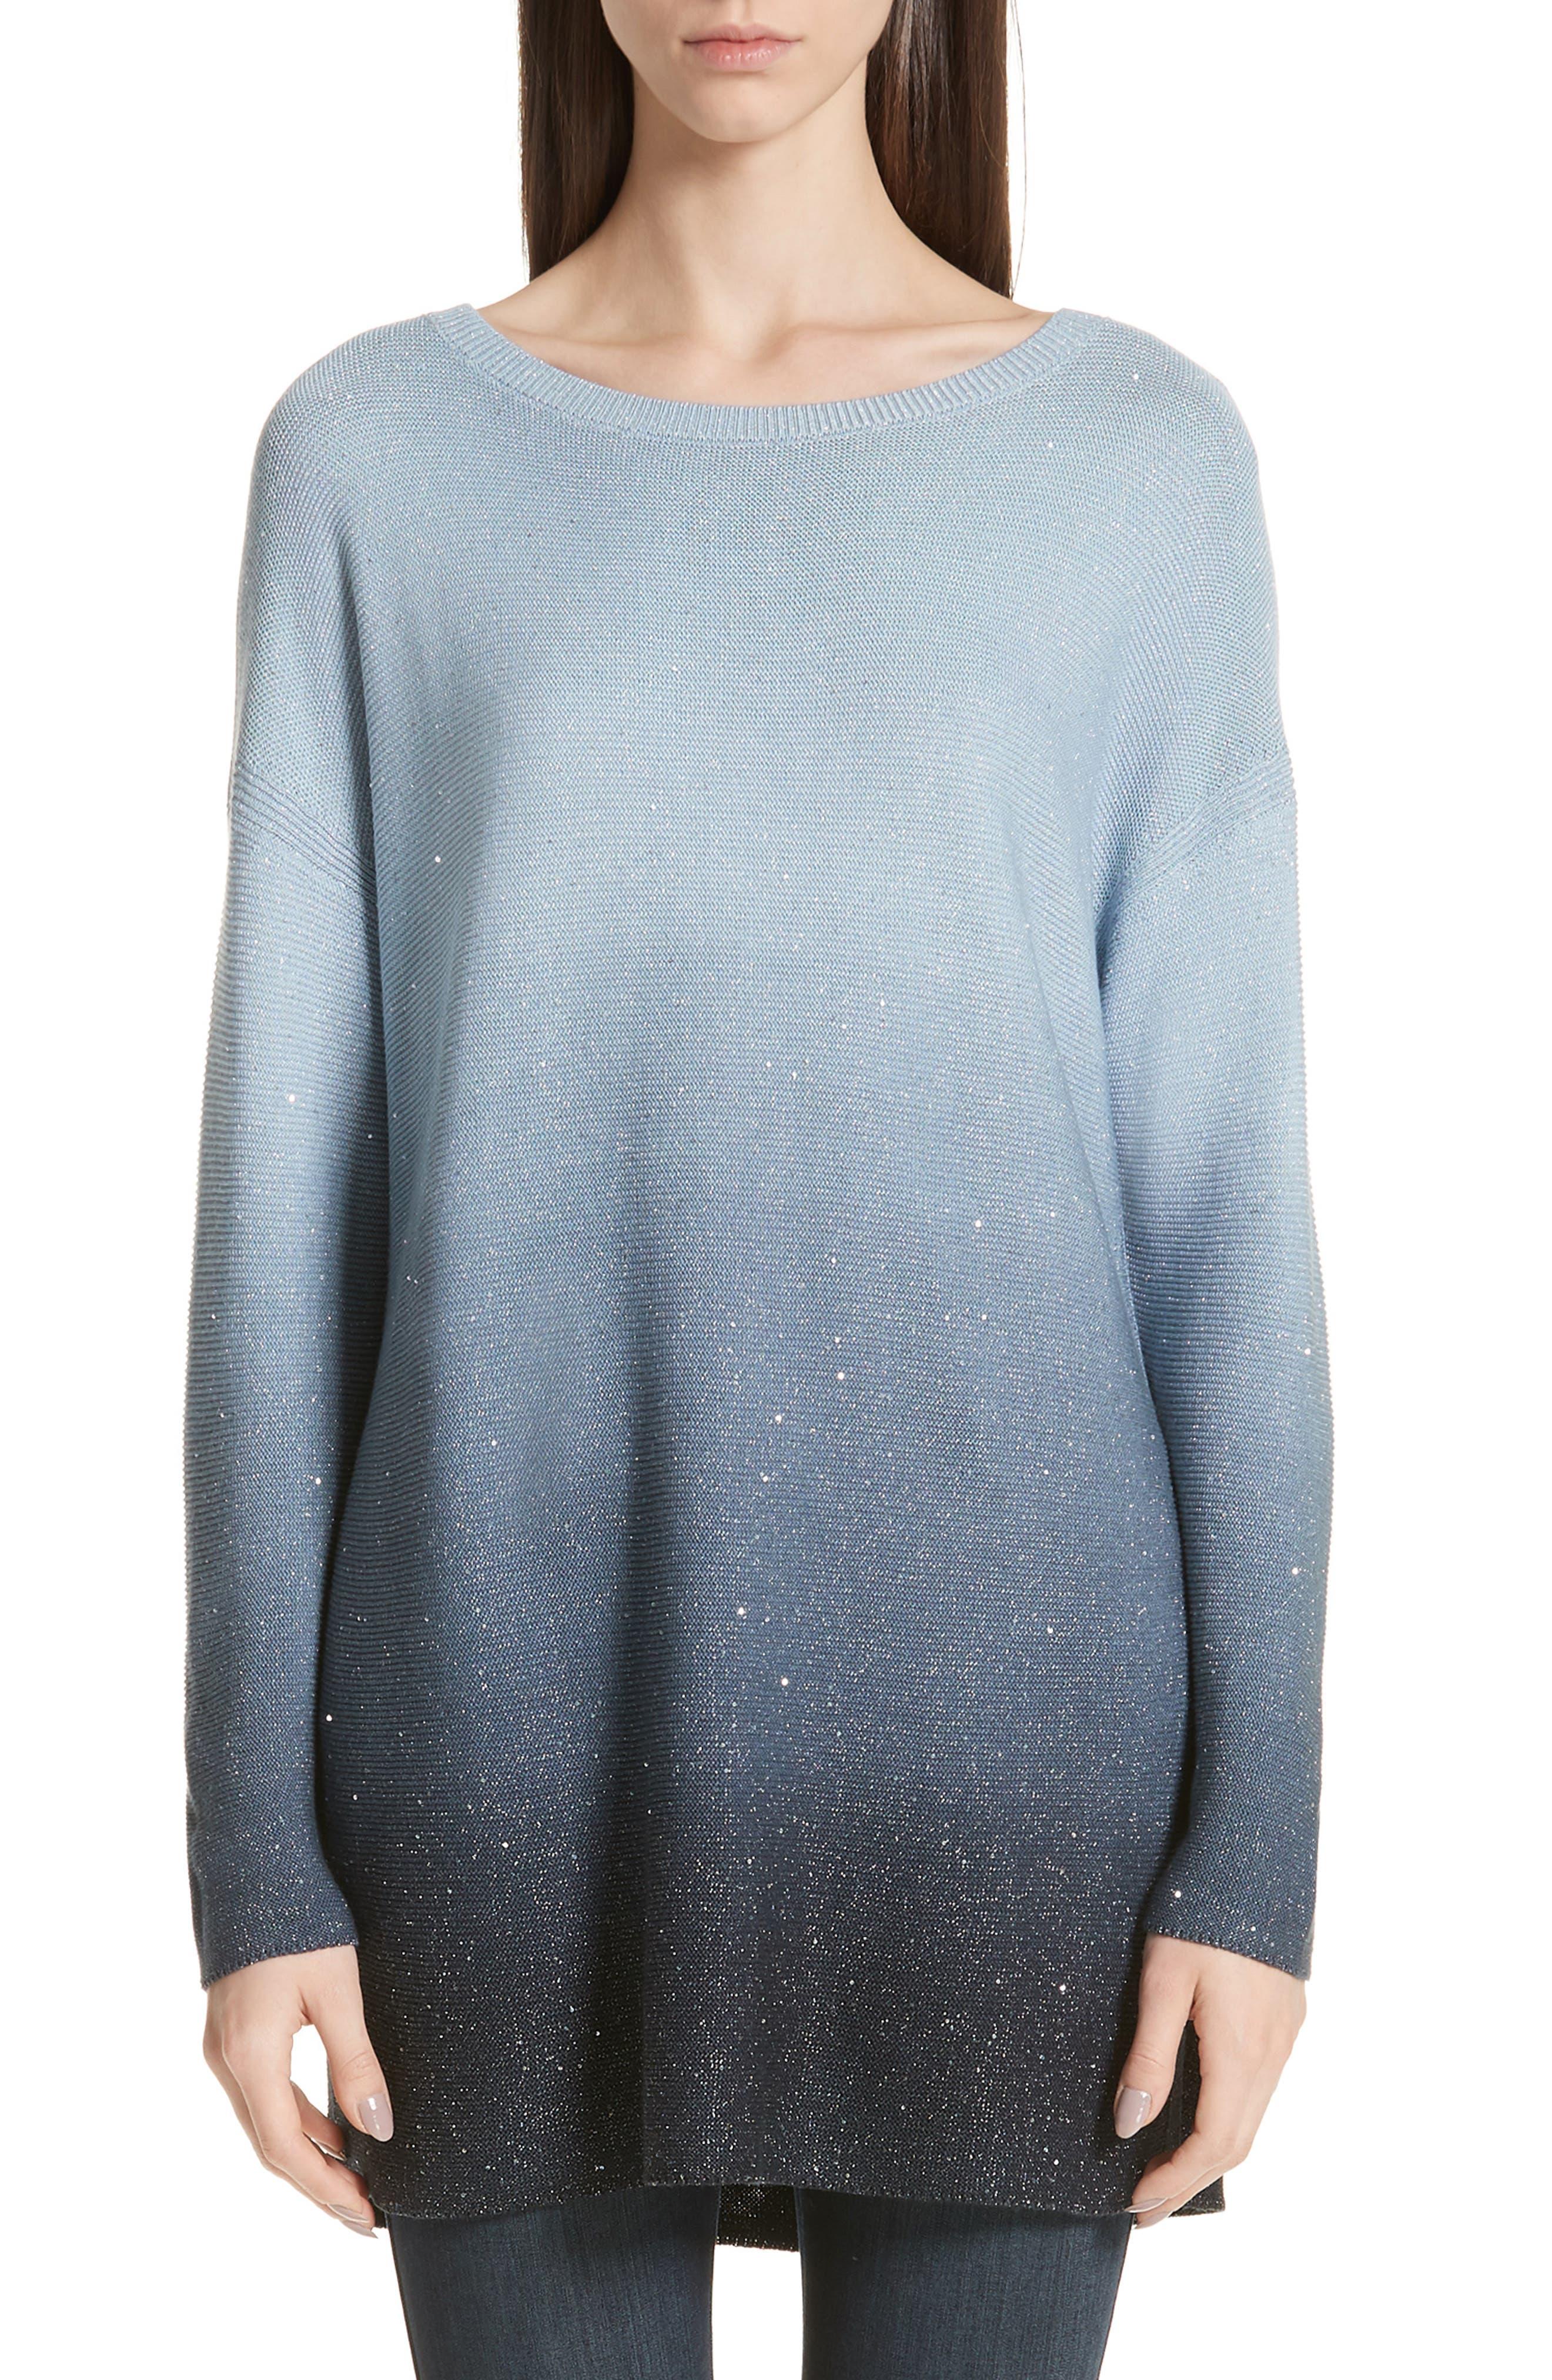 LAFAYETTE 148 NEW YORK, Sequin Ombré Silk Blend Tunic, Main thumbnail 1, color, SLATE BLUE MULTI